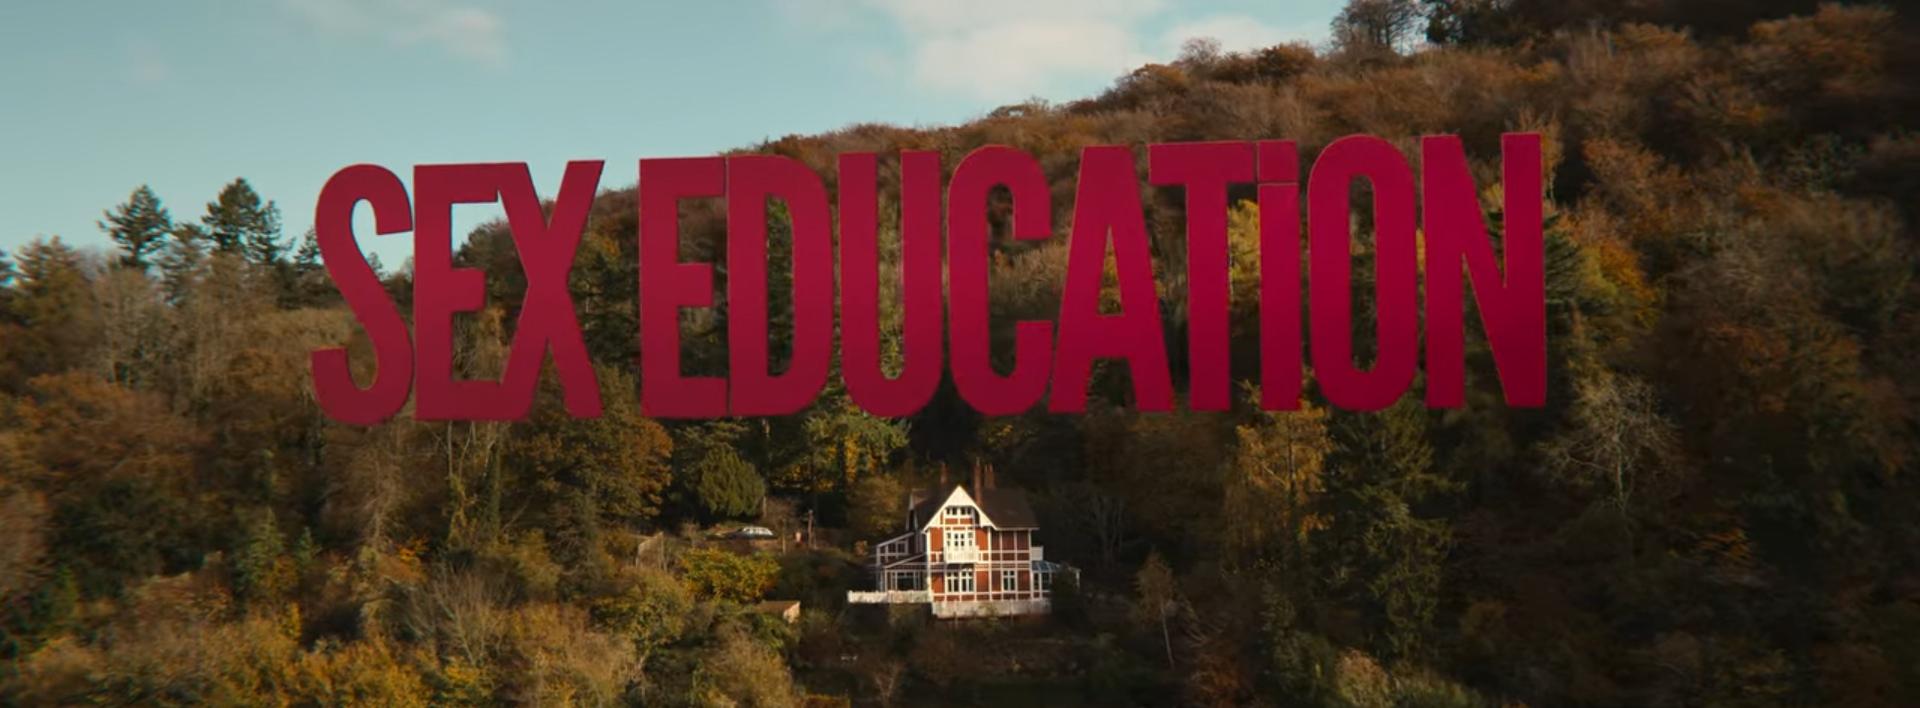 Sex Education. Image Credit: Netflix.